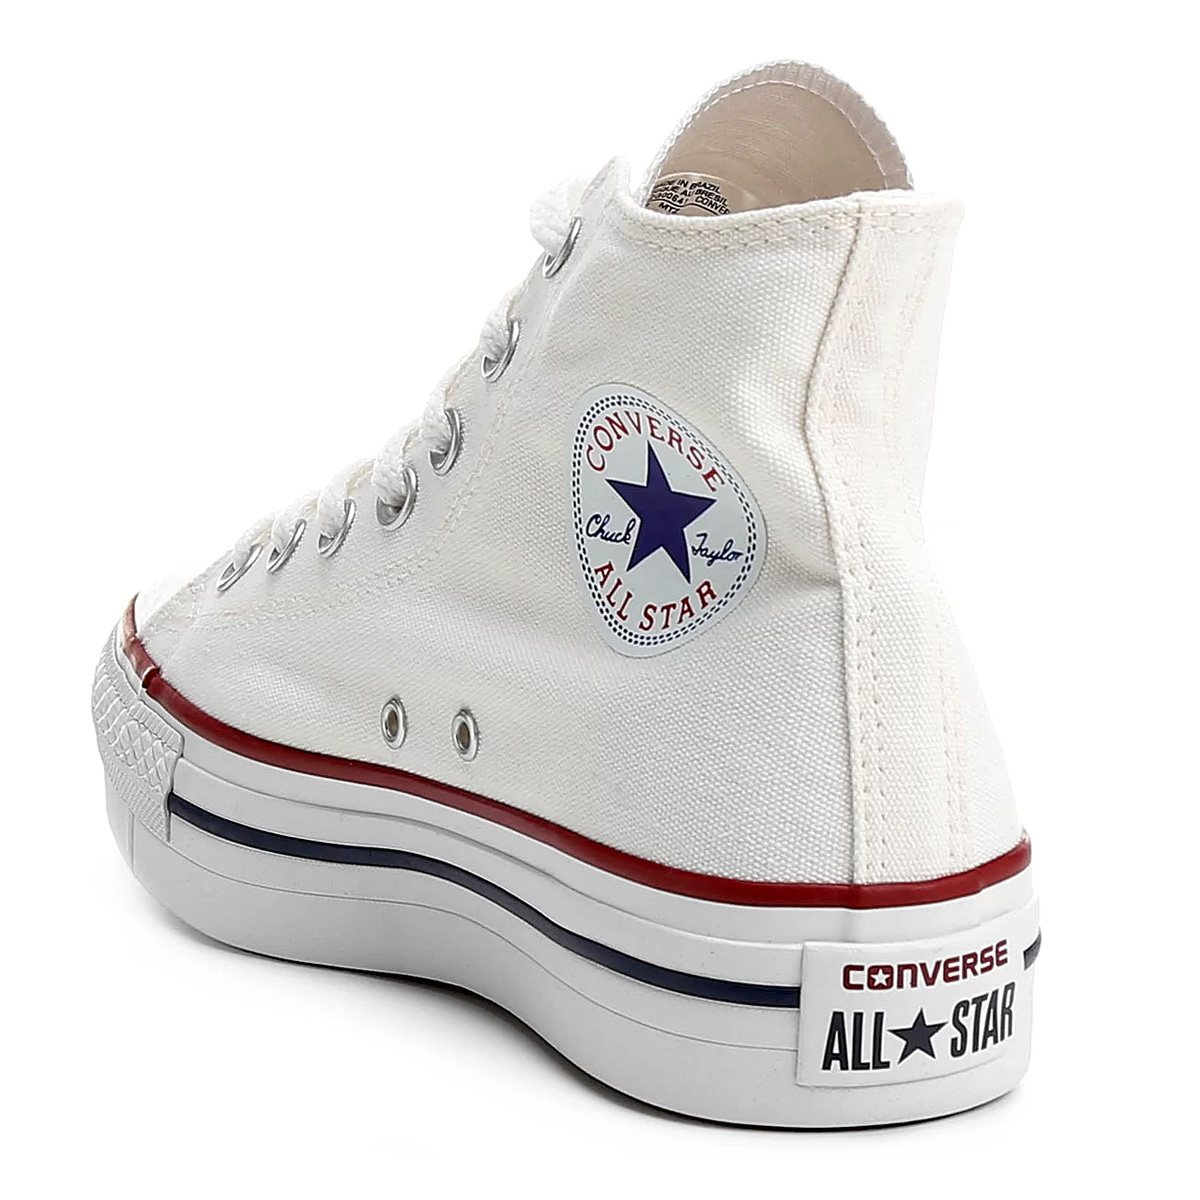 Tênis Converse All Star Chuck Taylor Plataforma Lift Hi Tecido Feminino